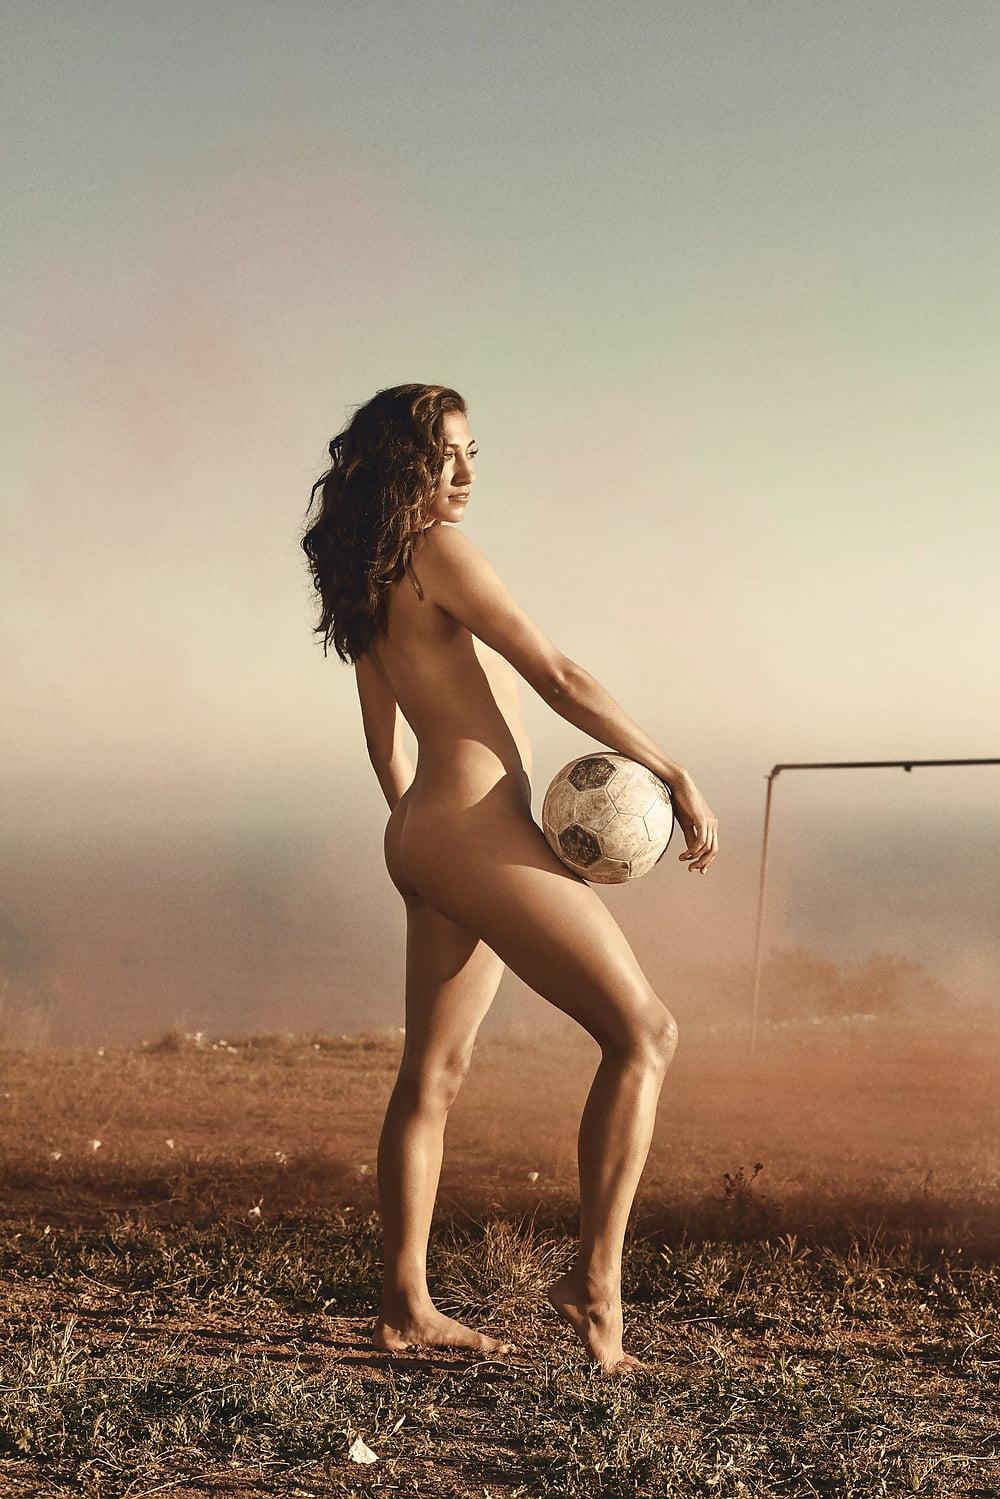 Beautiful nude athlete